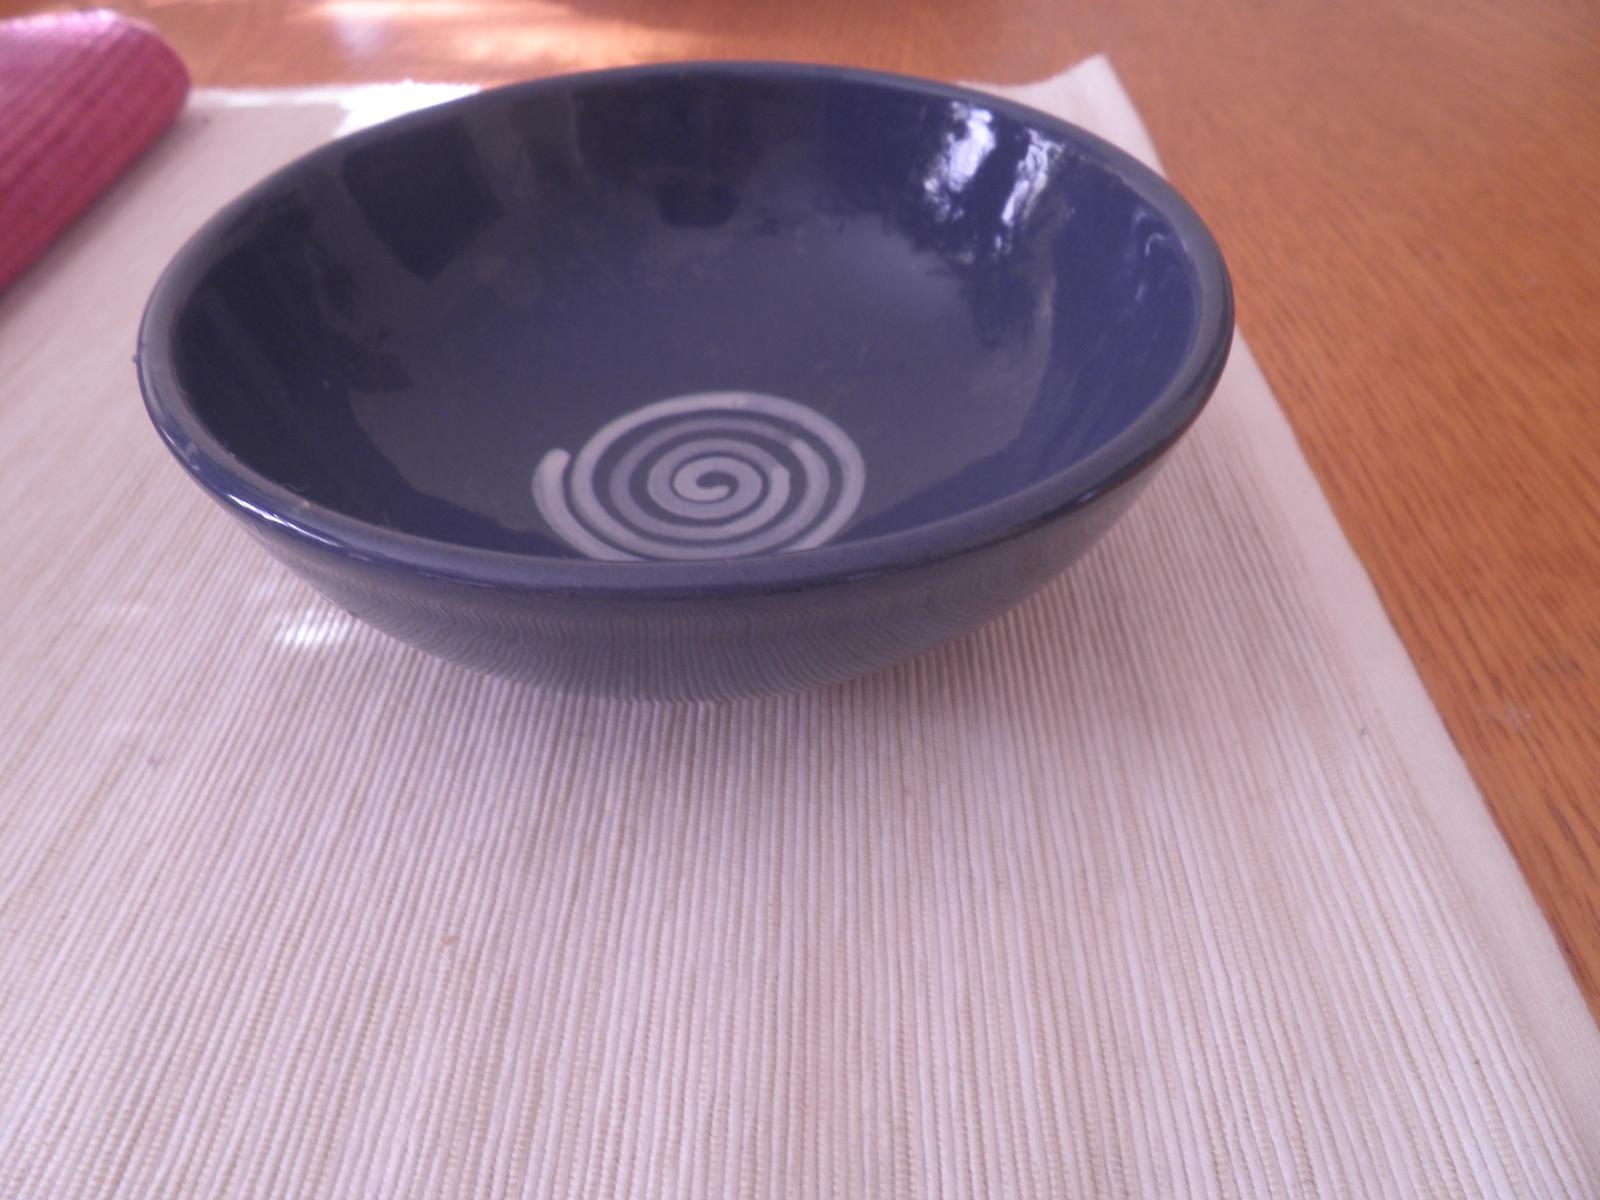 misky - modrá a biela - Obrázok č. 1